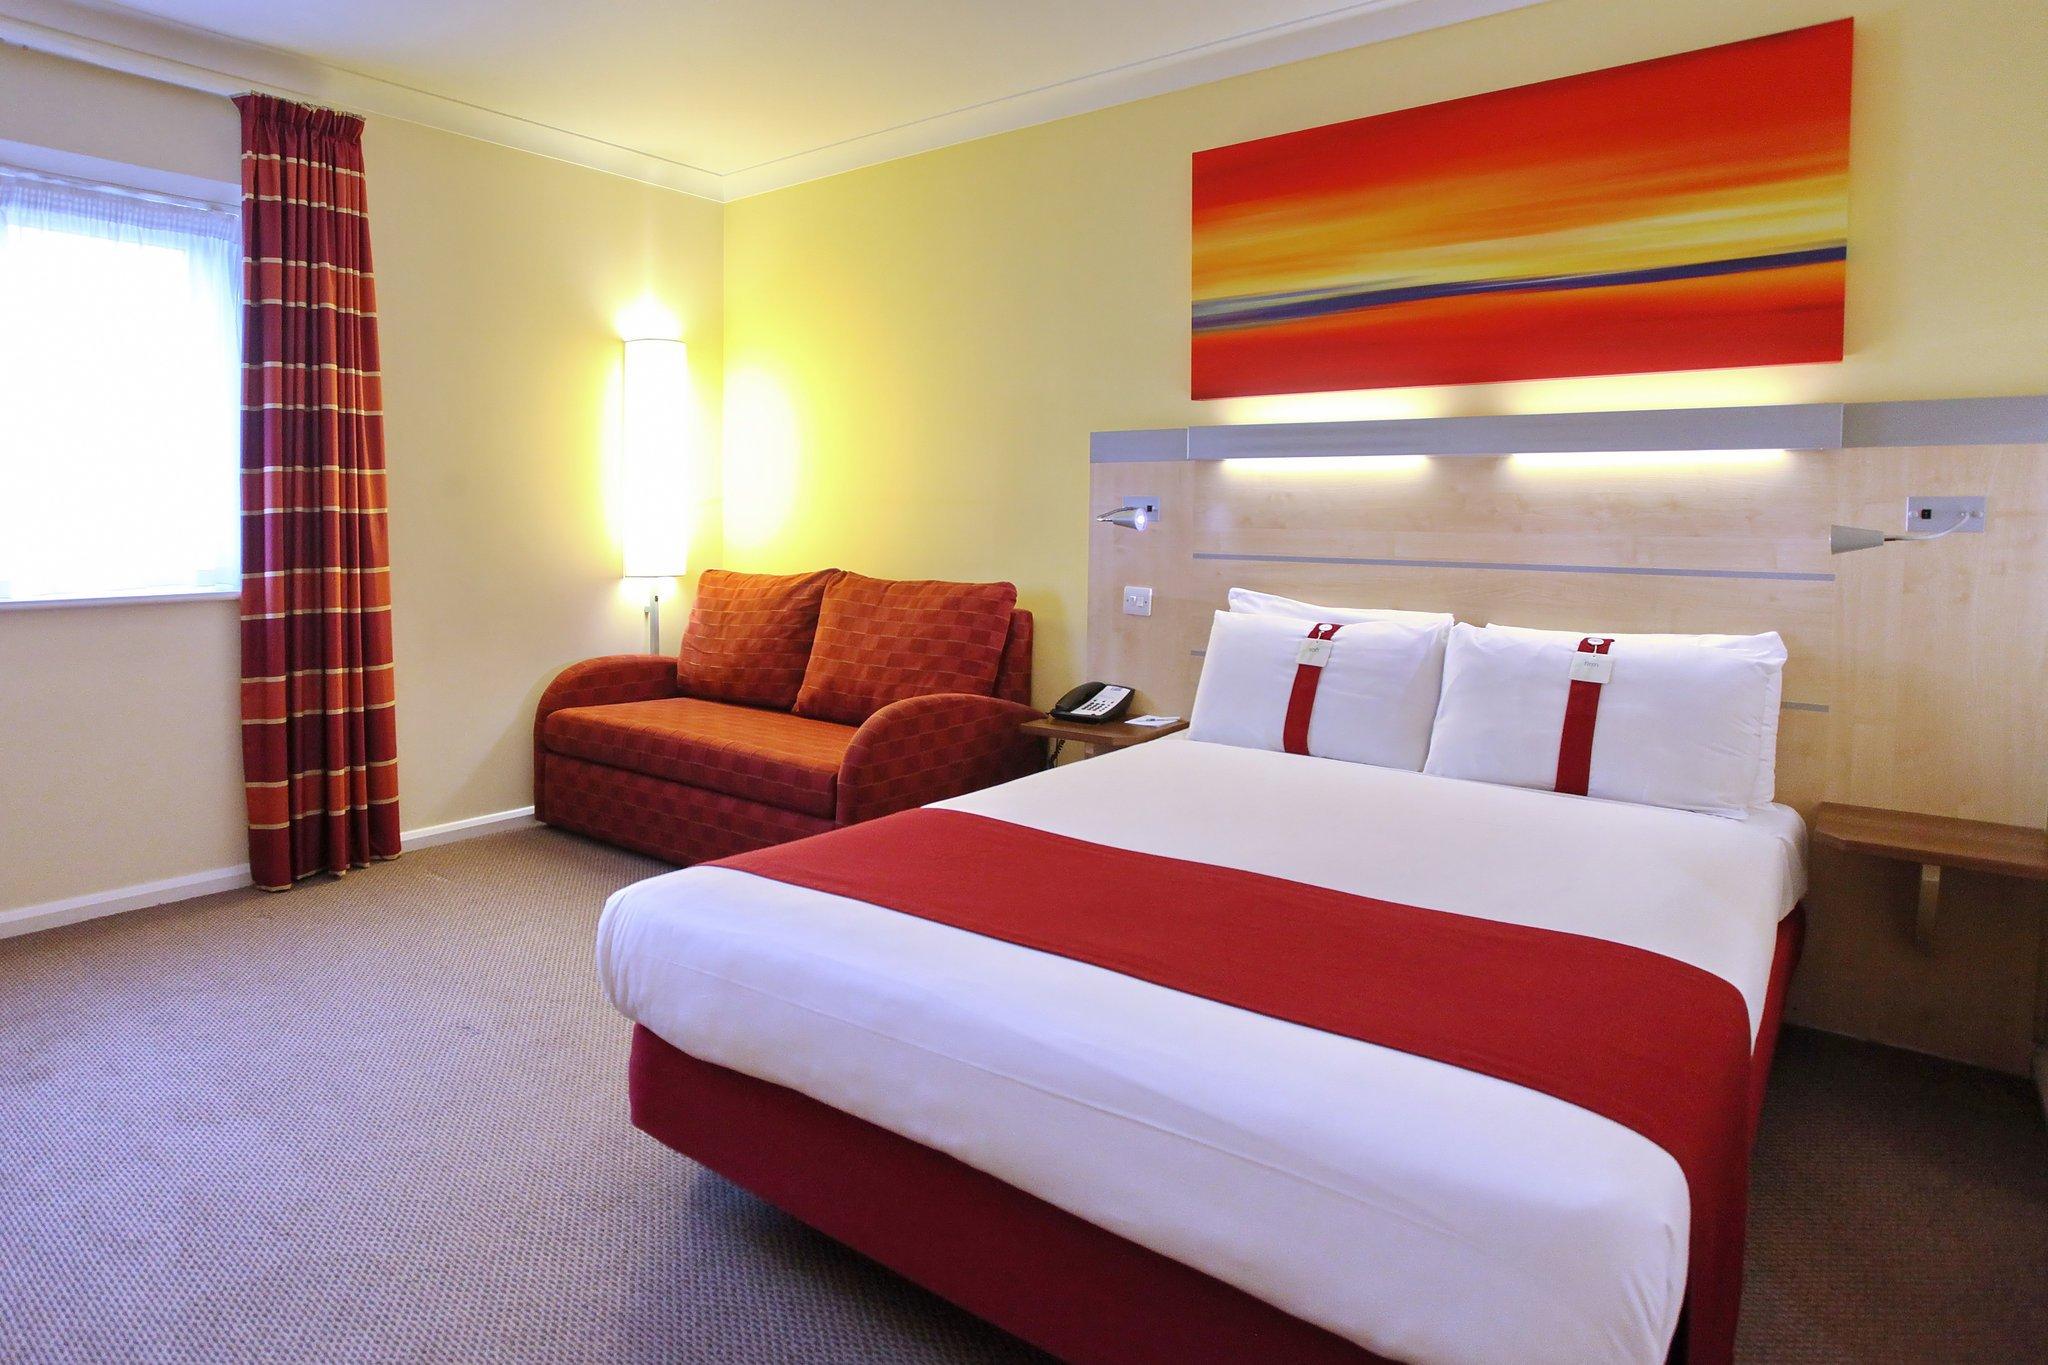 Holiday Inn Express Southampton M27 Jct 7